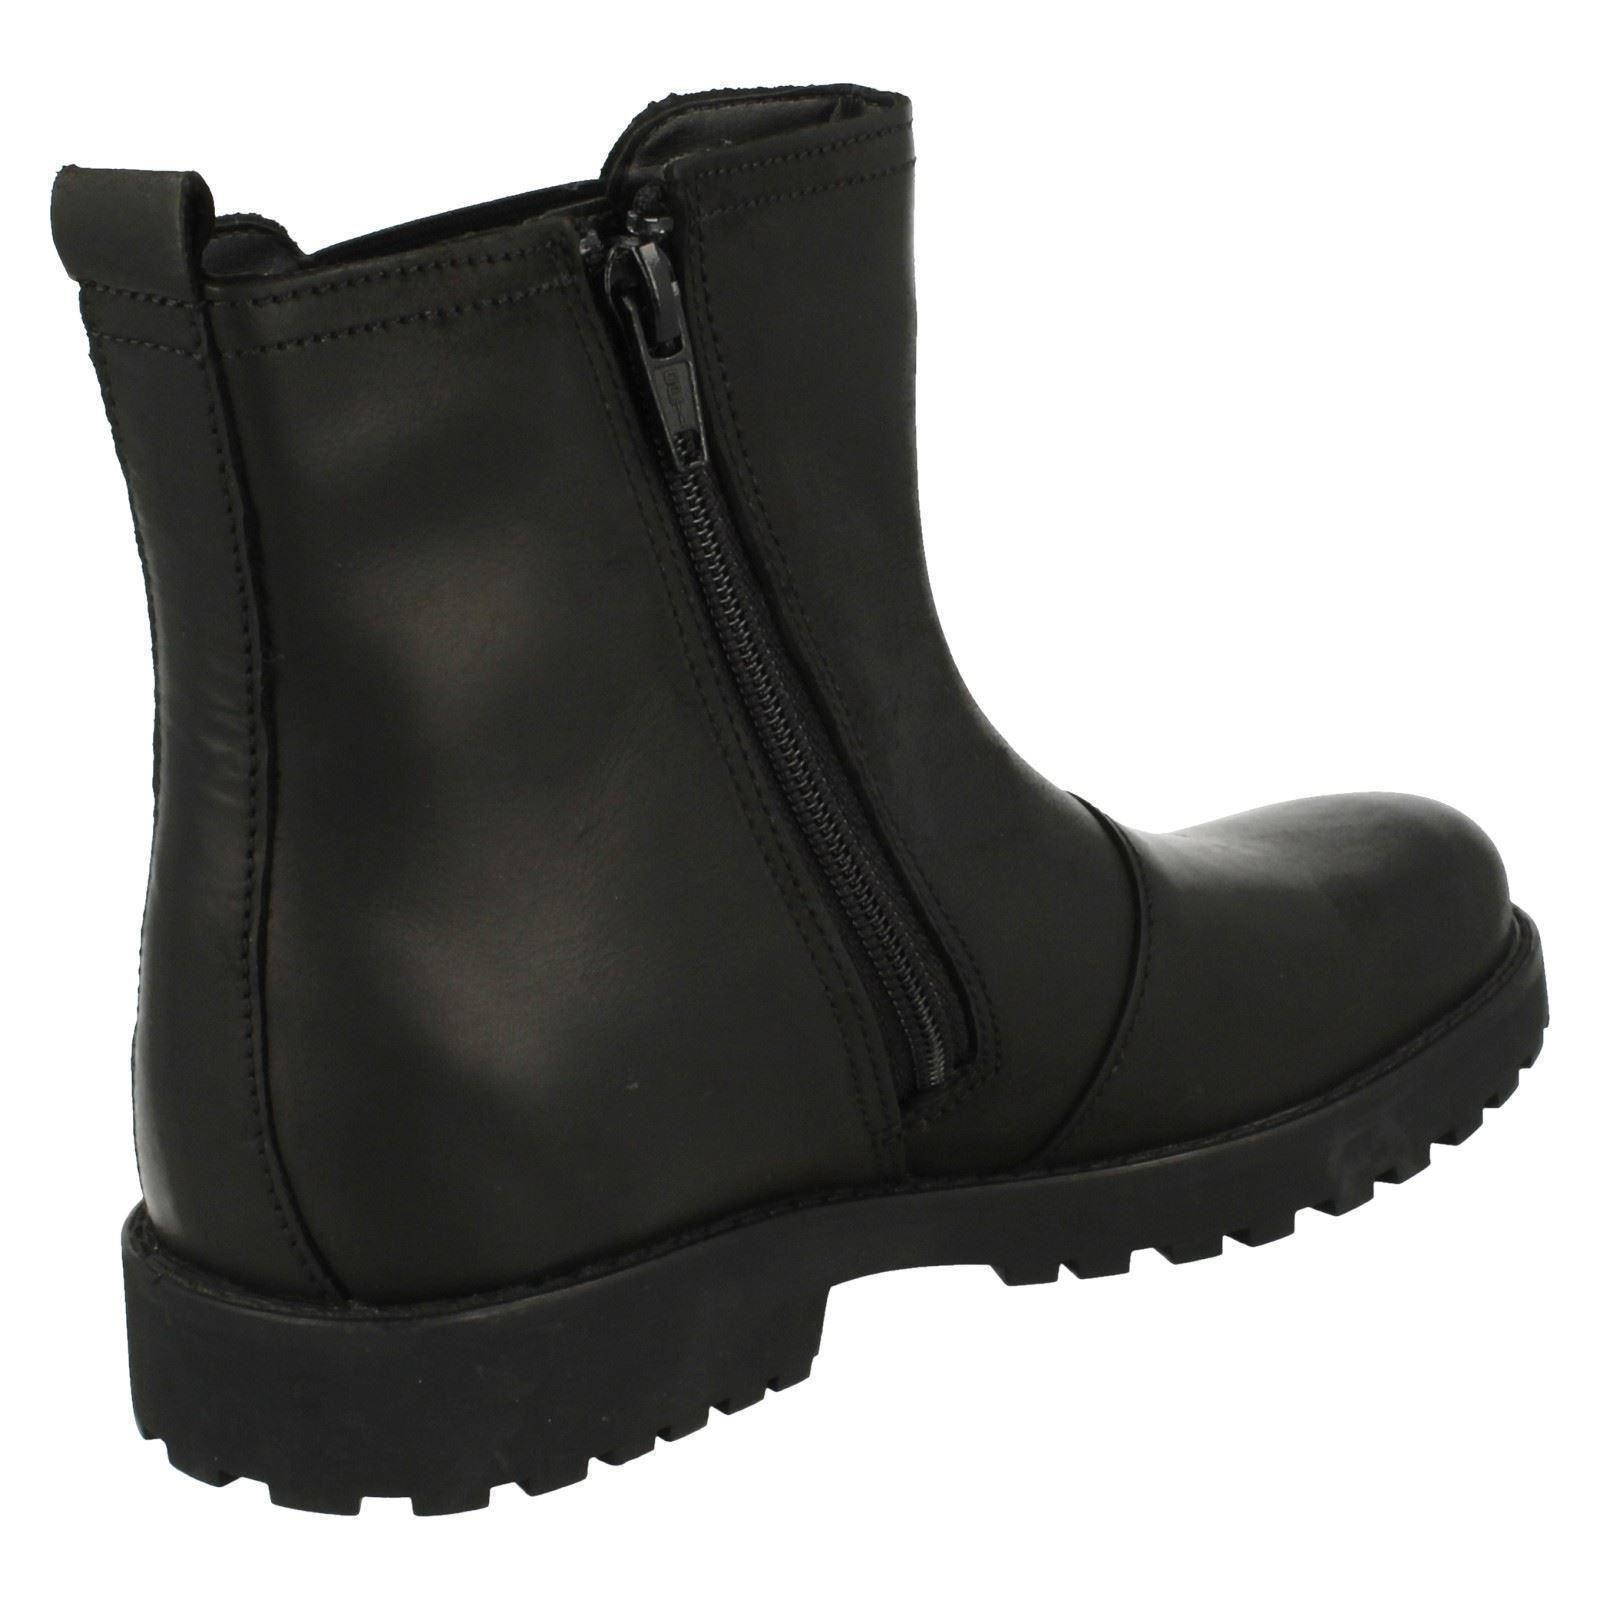 19dc08ae8e767e Girls Clarks Ankle Boots  Rhea Amber